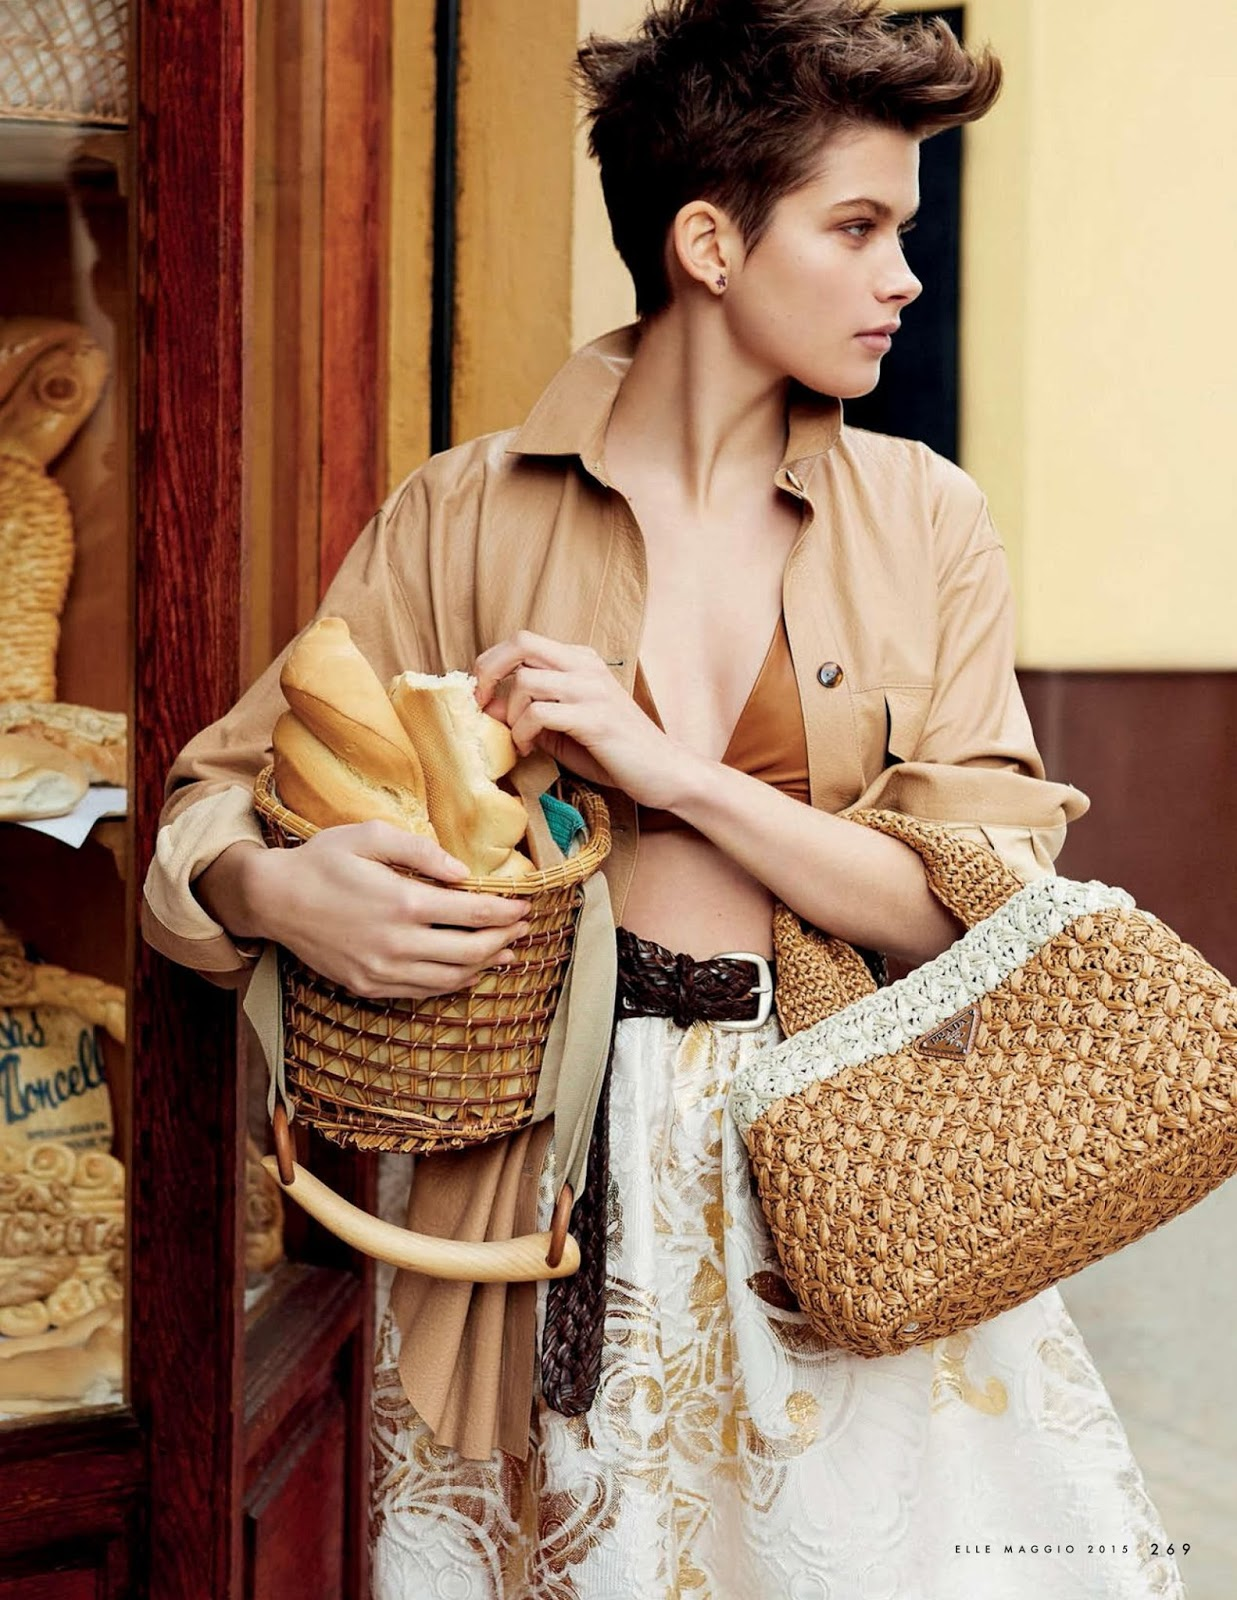 Benthe de Vries in La creativa / Elle Italia May 2015 (photography: Michael Sanders, styling: Benedetta Dell'Orto) via fashioned by love british fashion blog